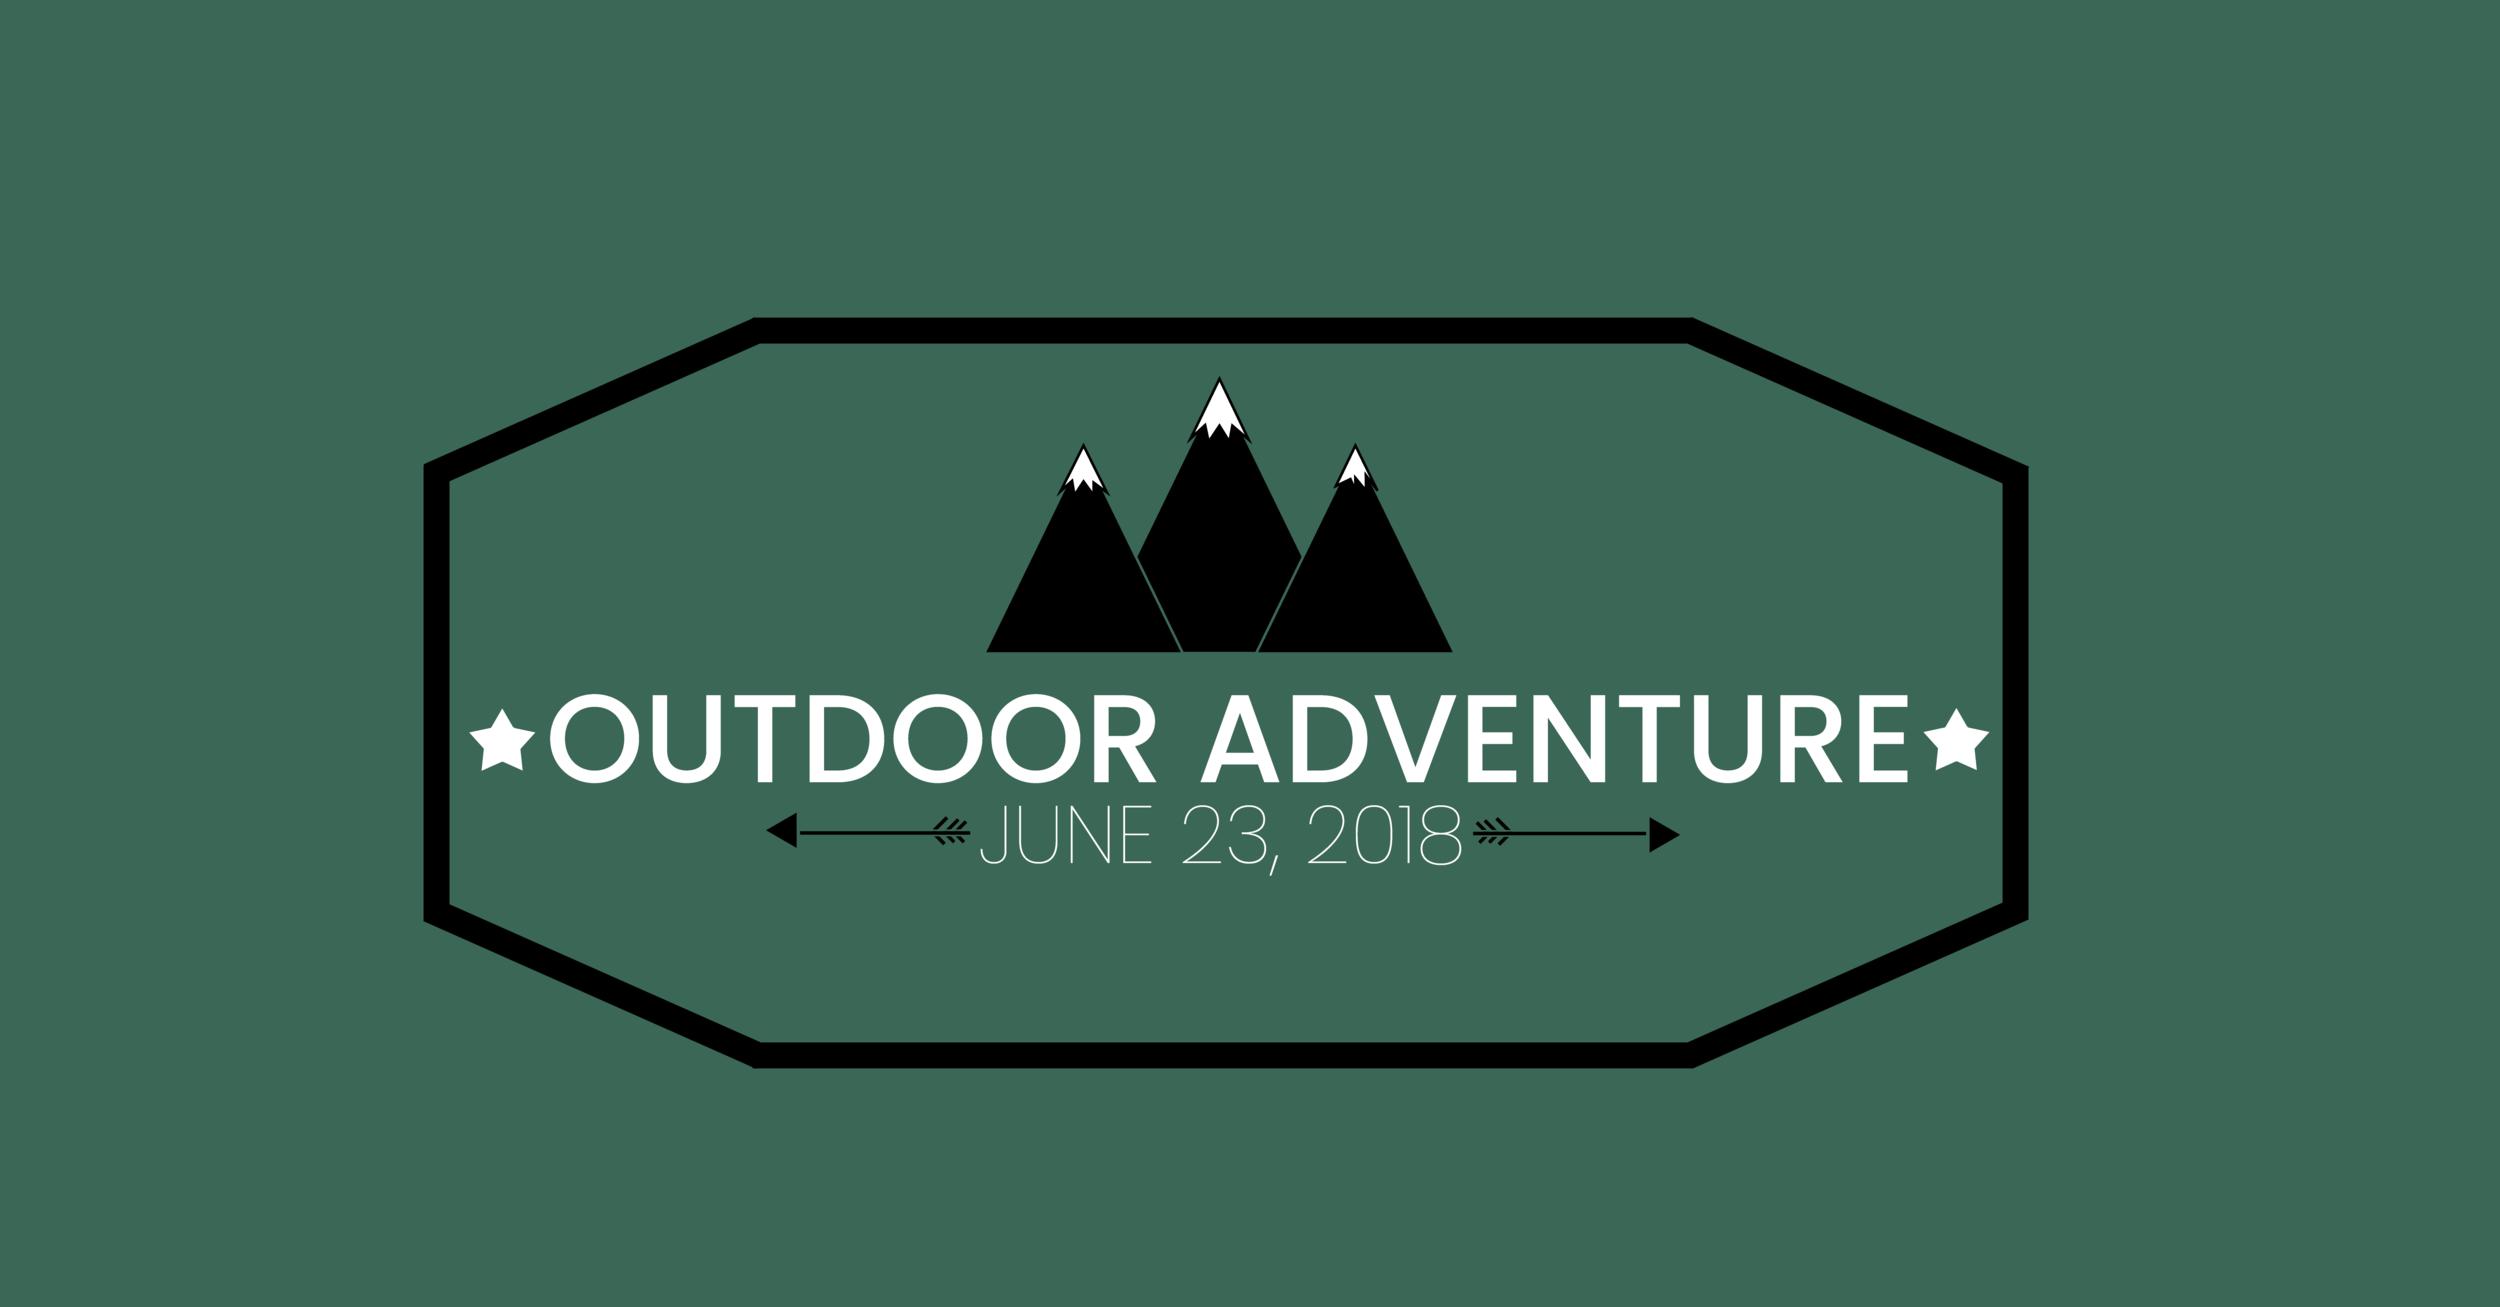 outdooradventure.png